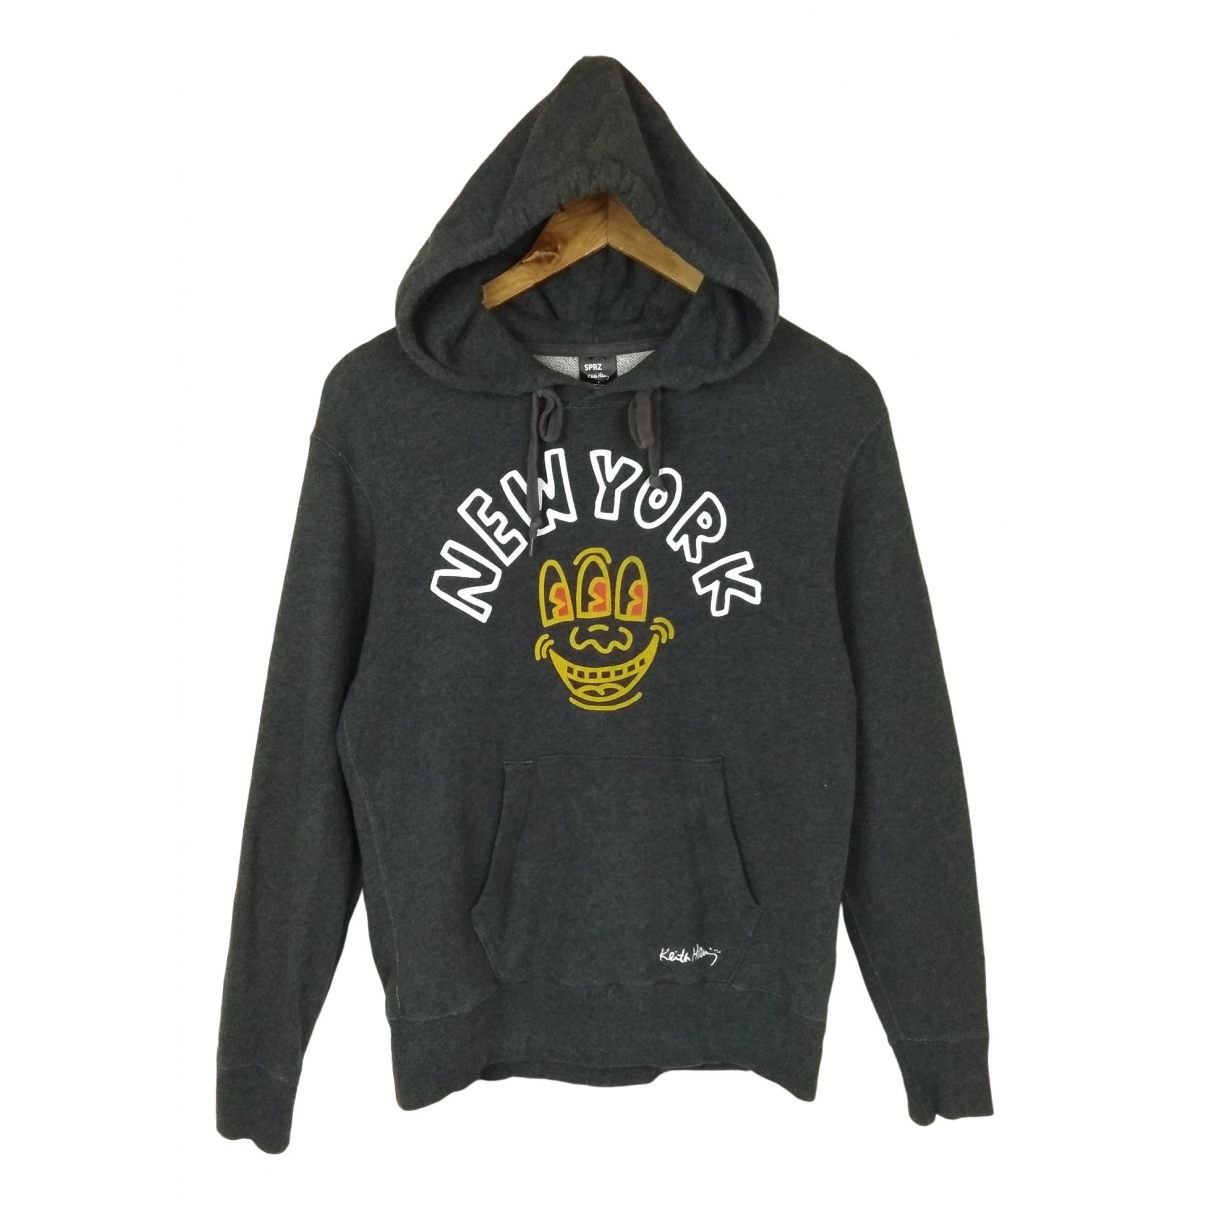 Keith Haring \N Grey Cotton Knitwear & Sweatshirts for Men S International